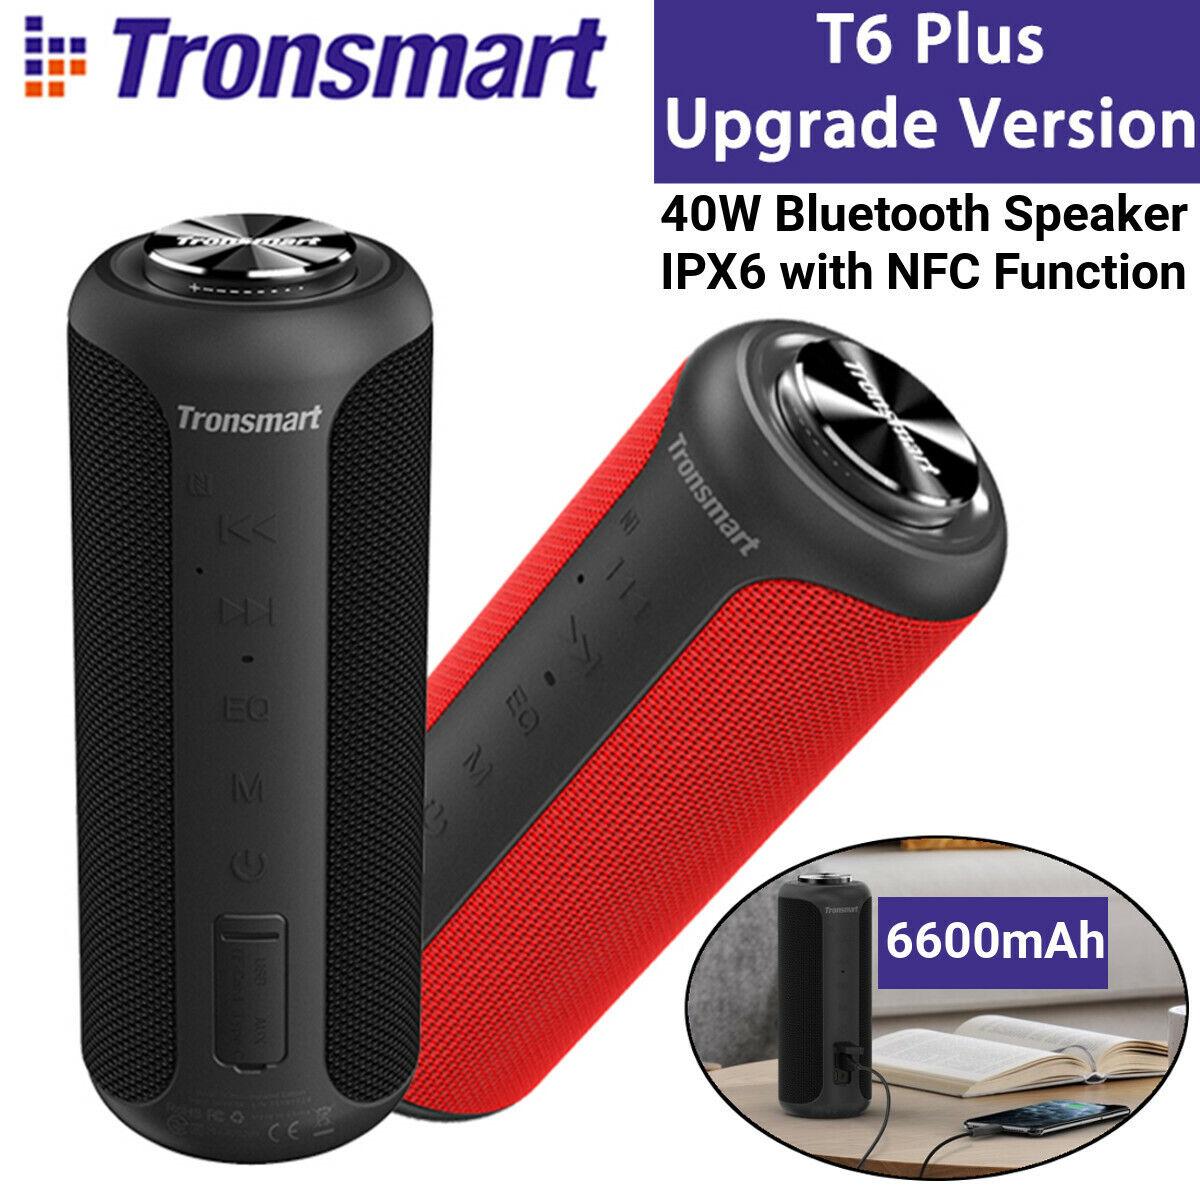 Tronsmart T6 Plus Upgraded Cassa Speaker 40W, IPX6 Powerbank, Altoparlanti , NFC